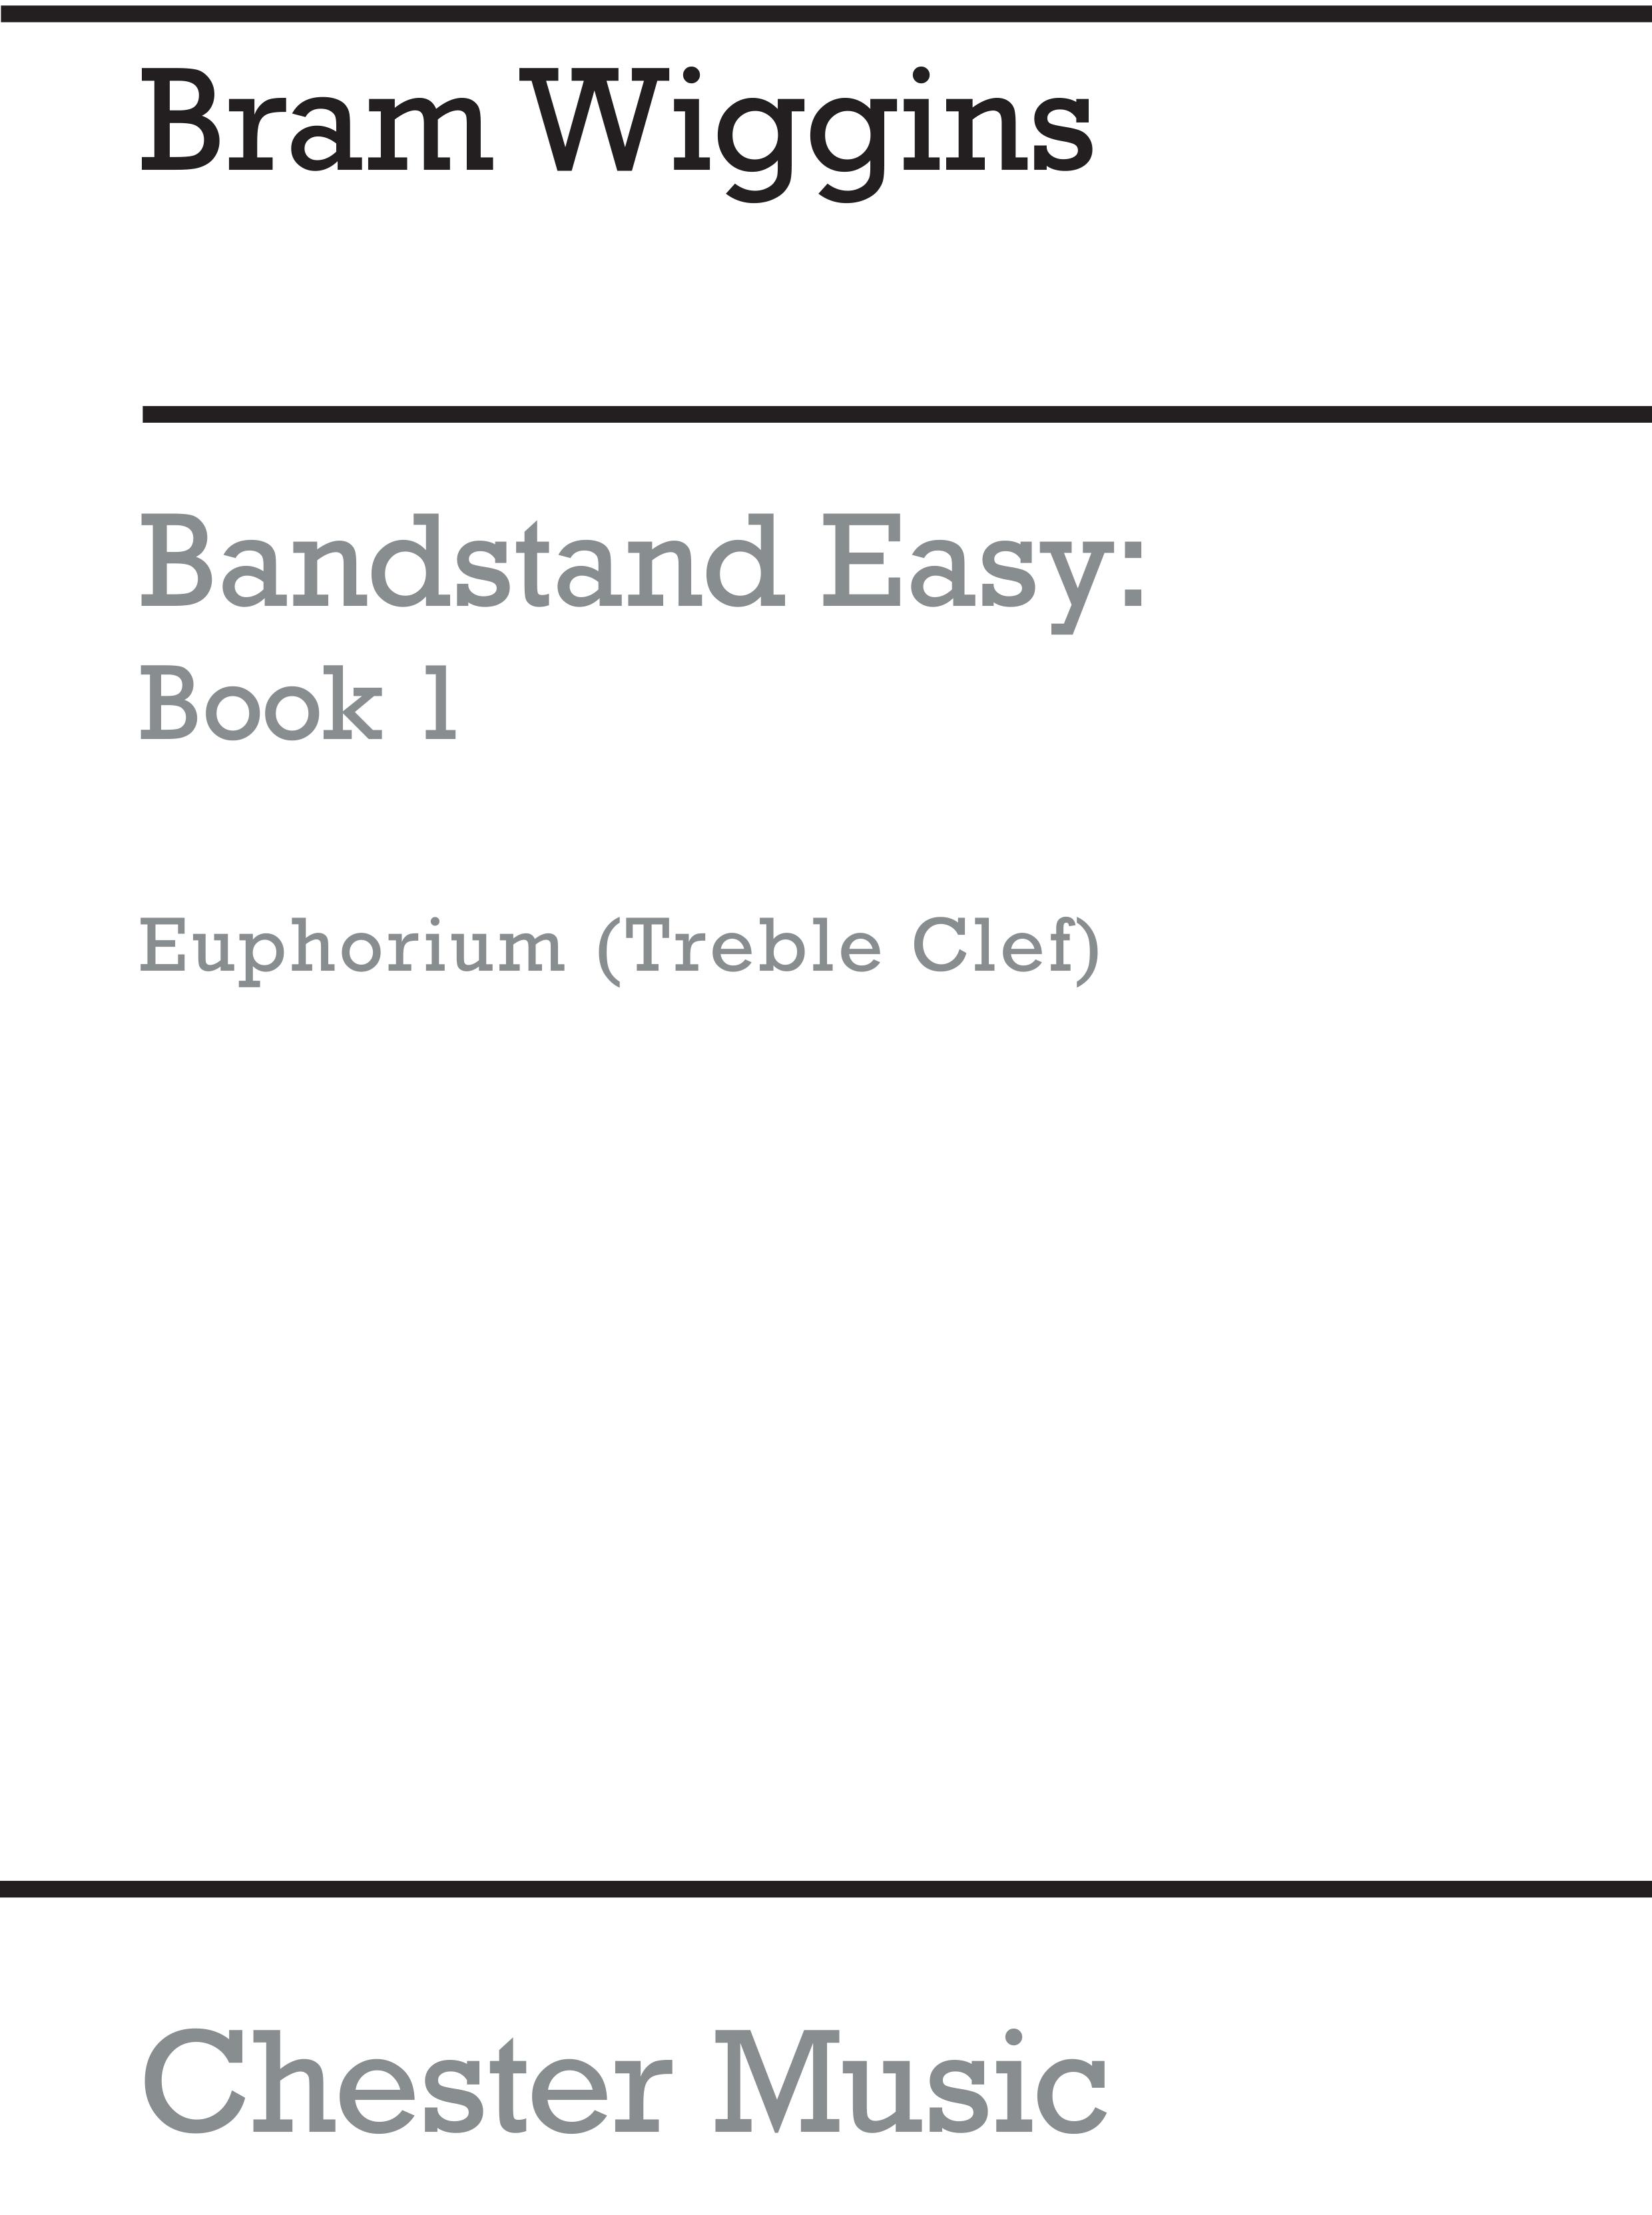 Bram Wiggins: Bandstand Easy Book 1 (Euphonium TC): Concert Band: Part